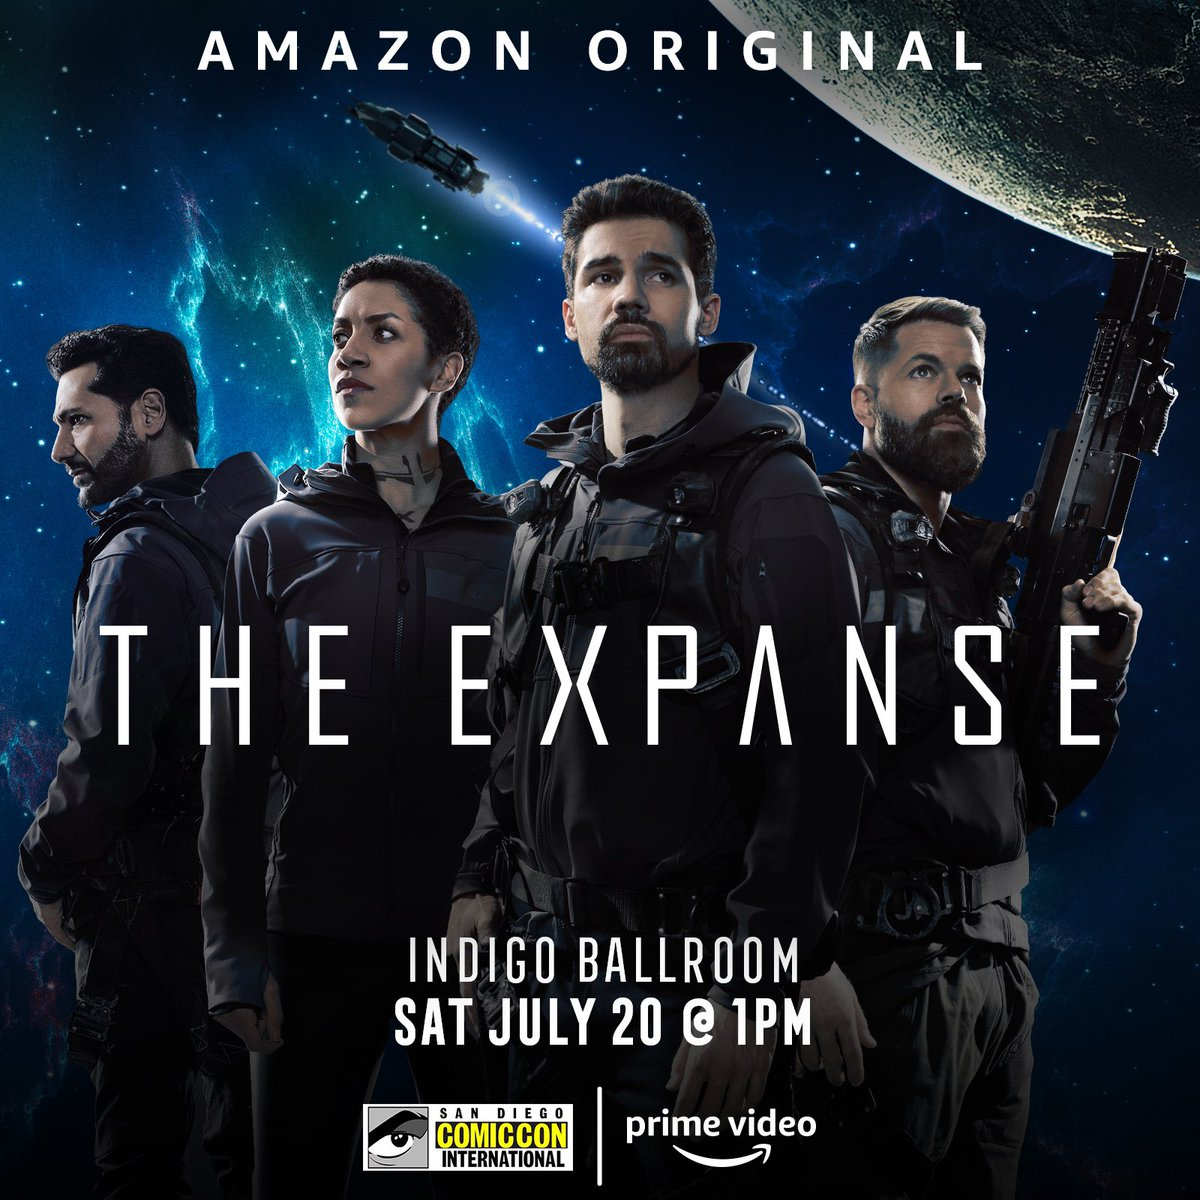 The Expanse Amazon